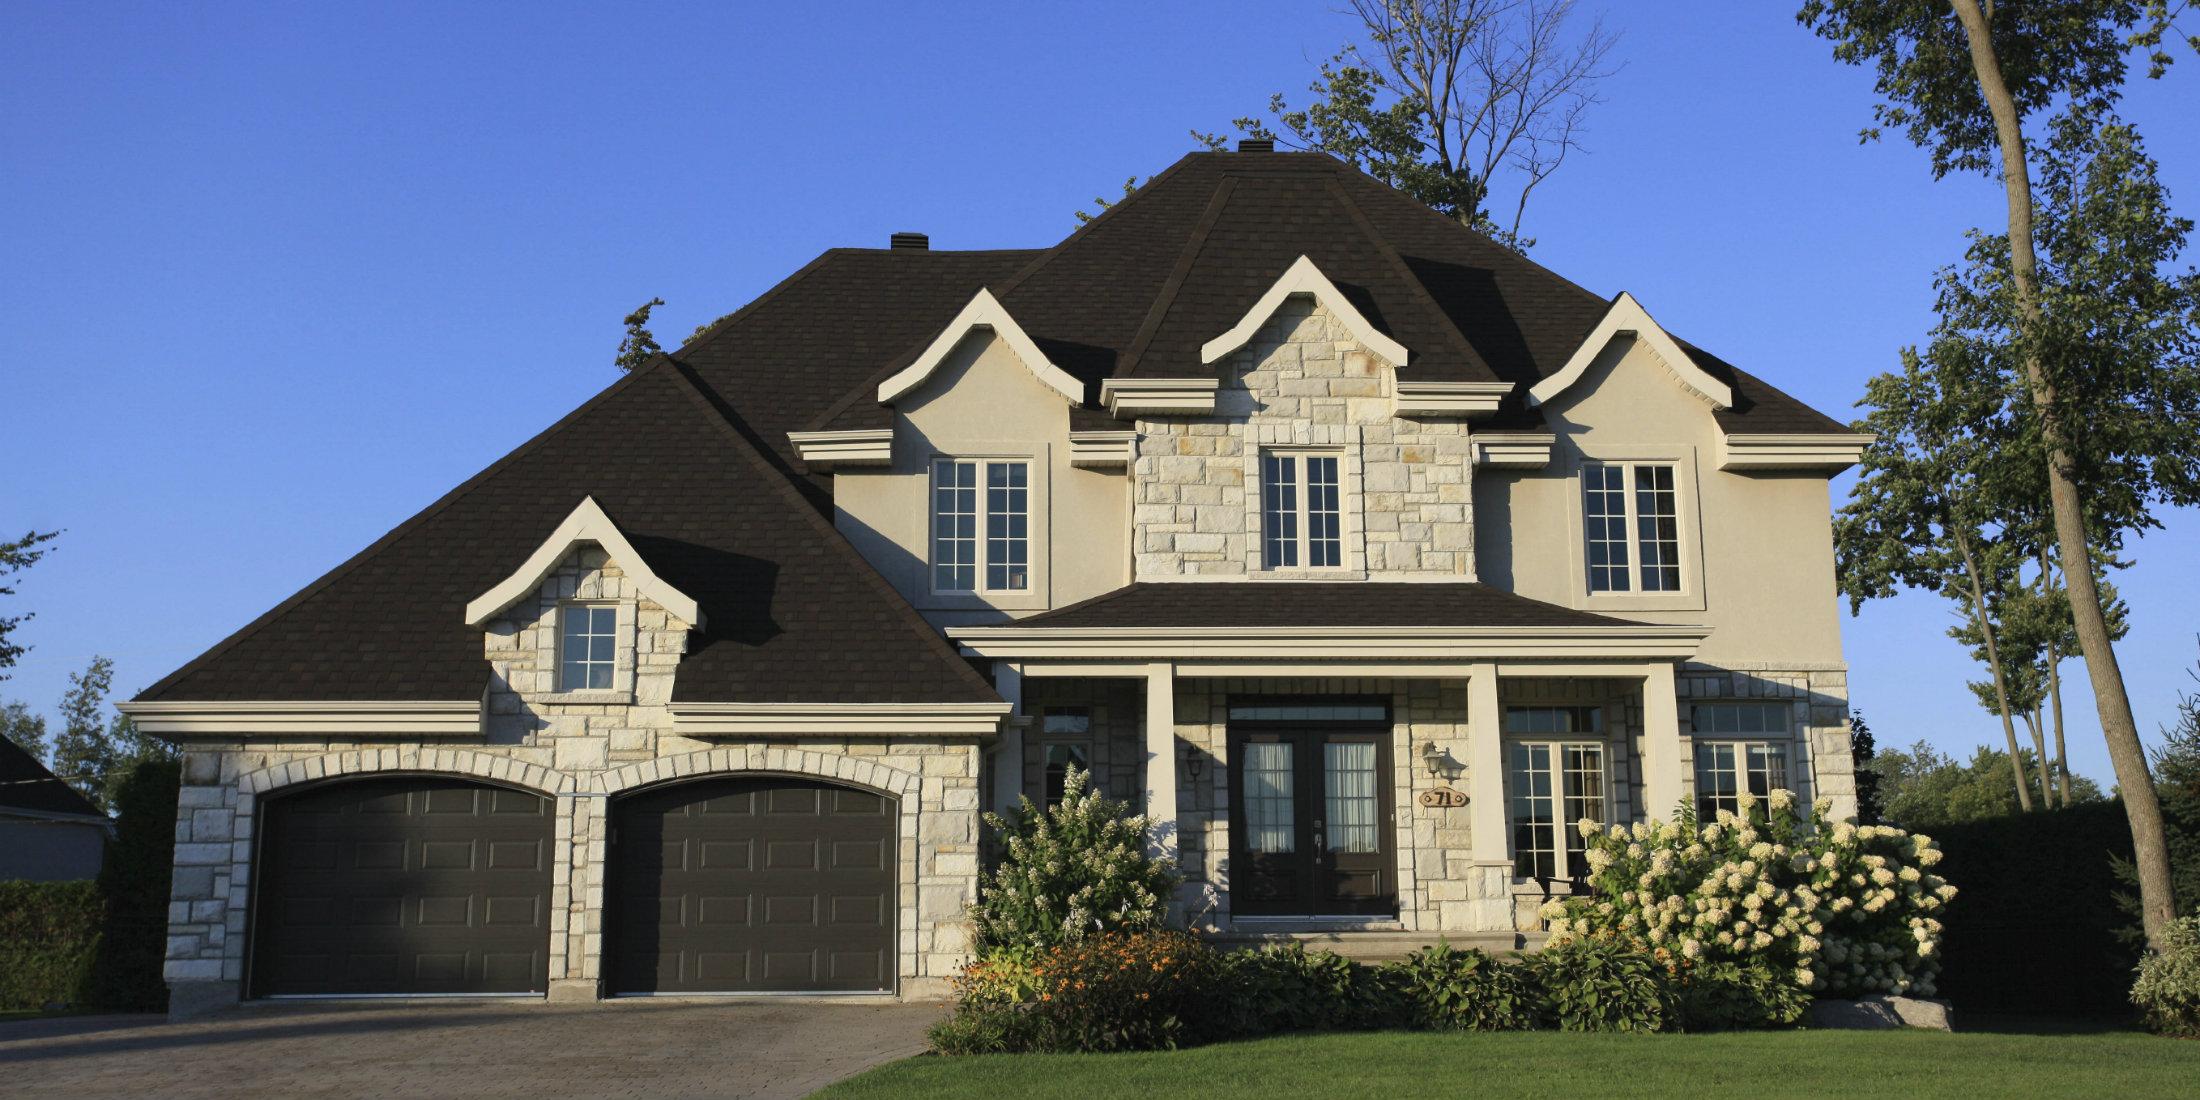 Wauconda Real Estate Wauconda Homes For Sale